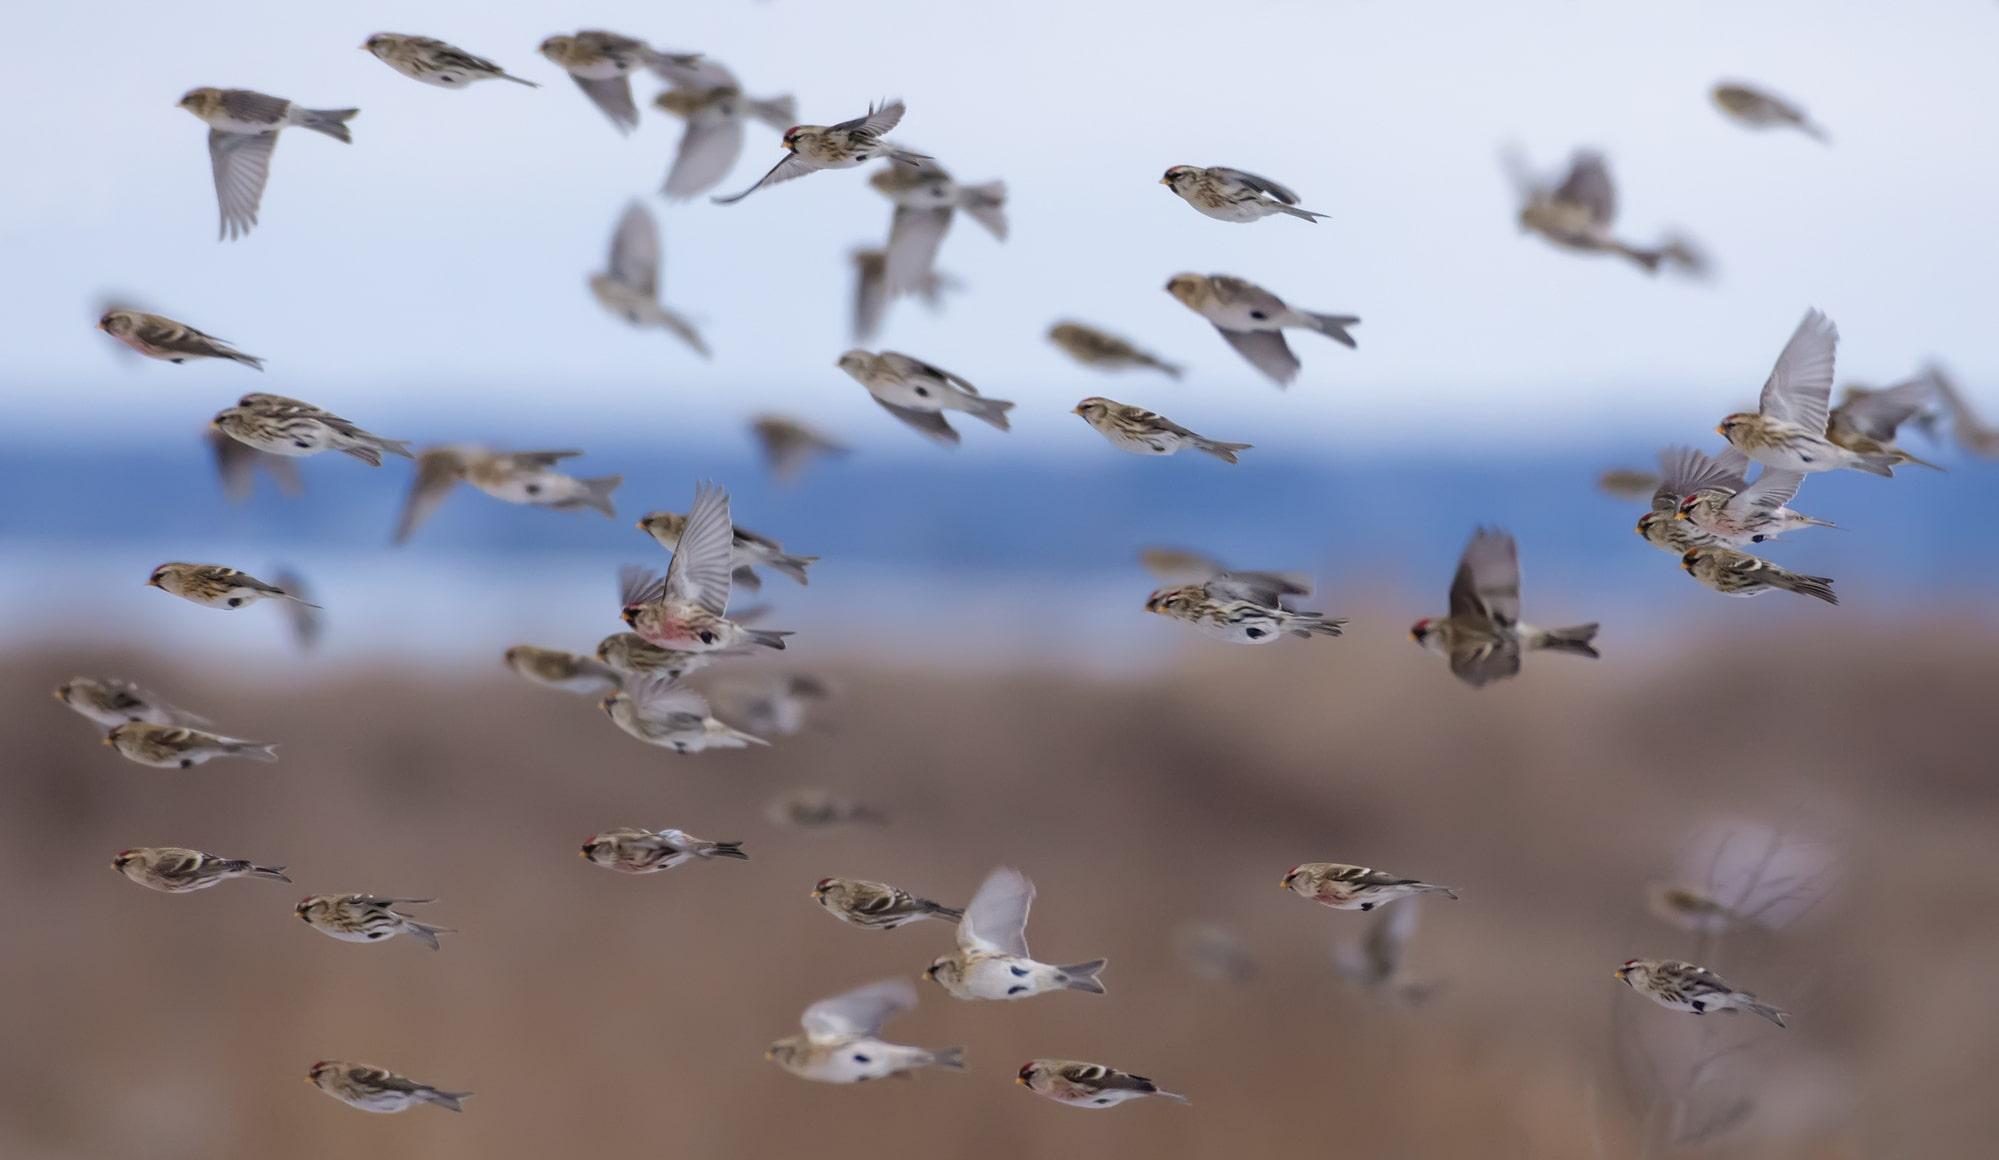 Herd of common redpolls flying fast in snowy winter over fields